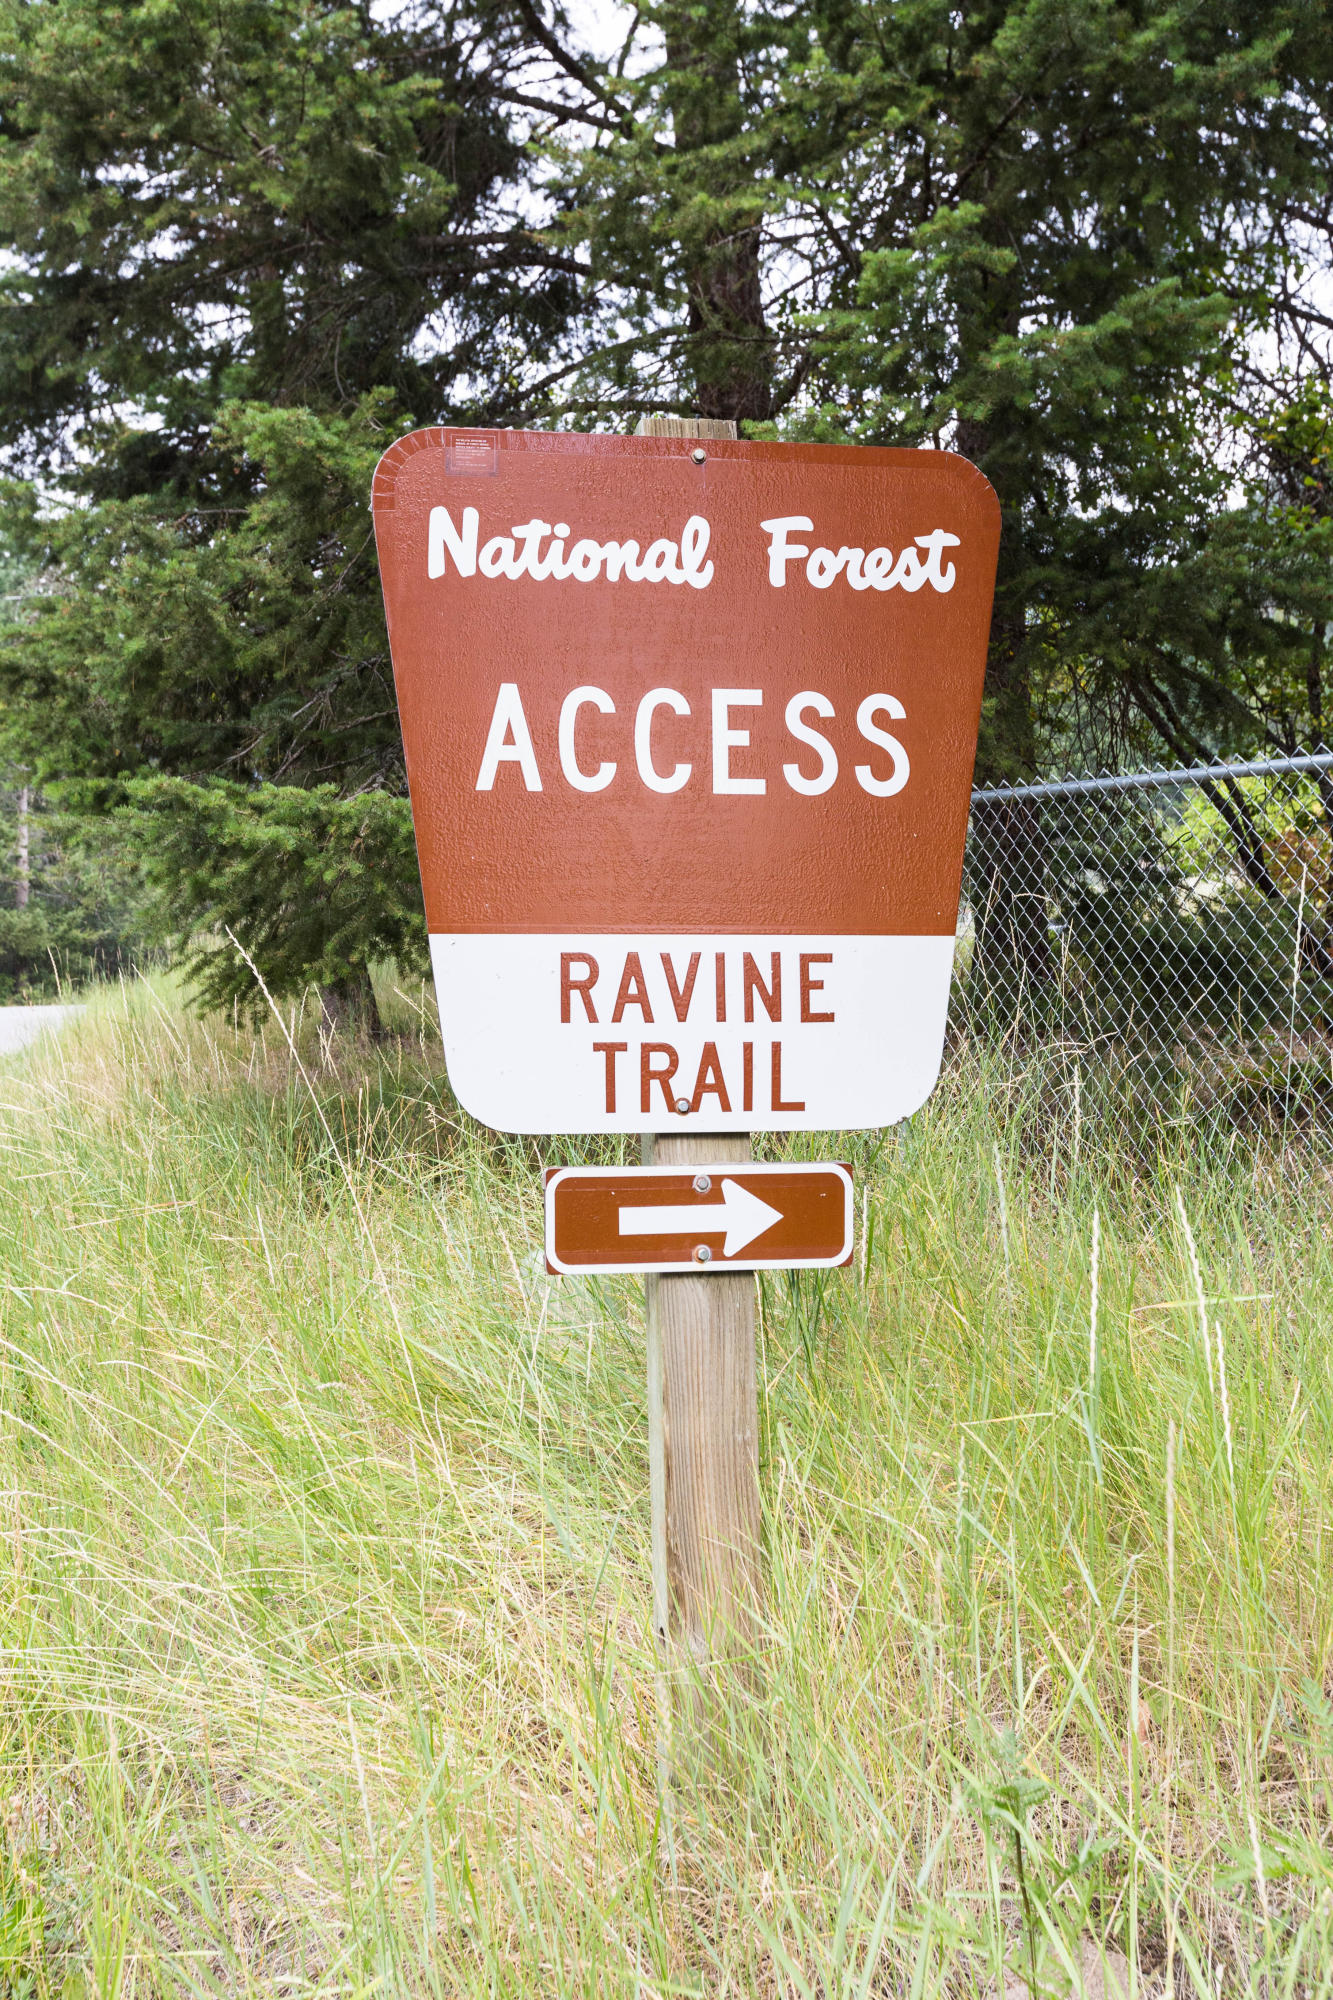 Ravine Trail Access